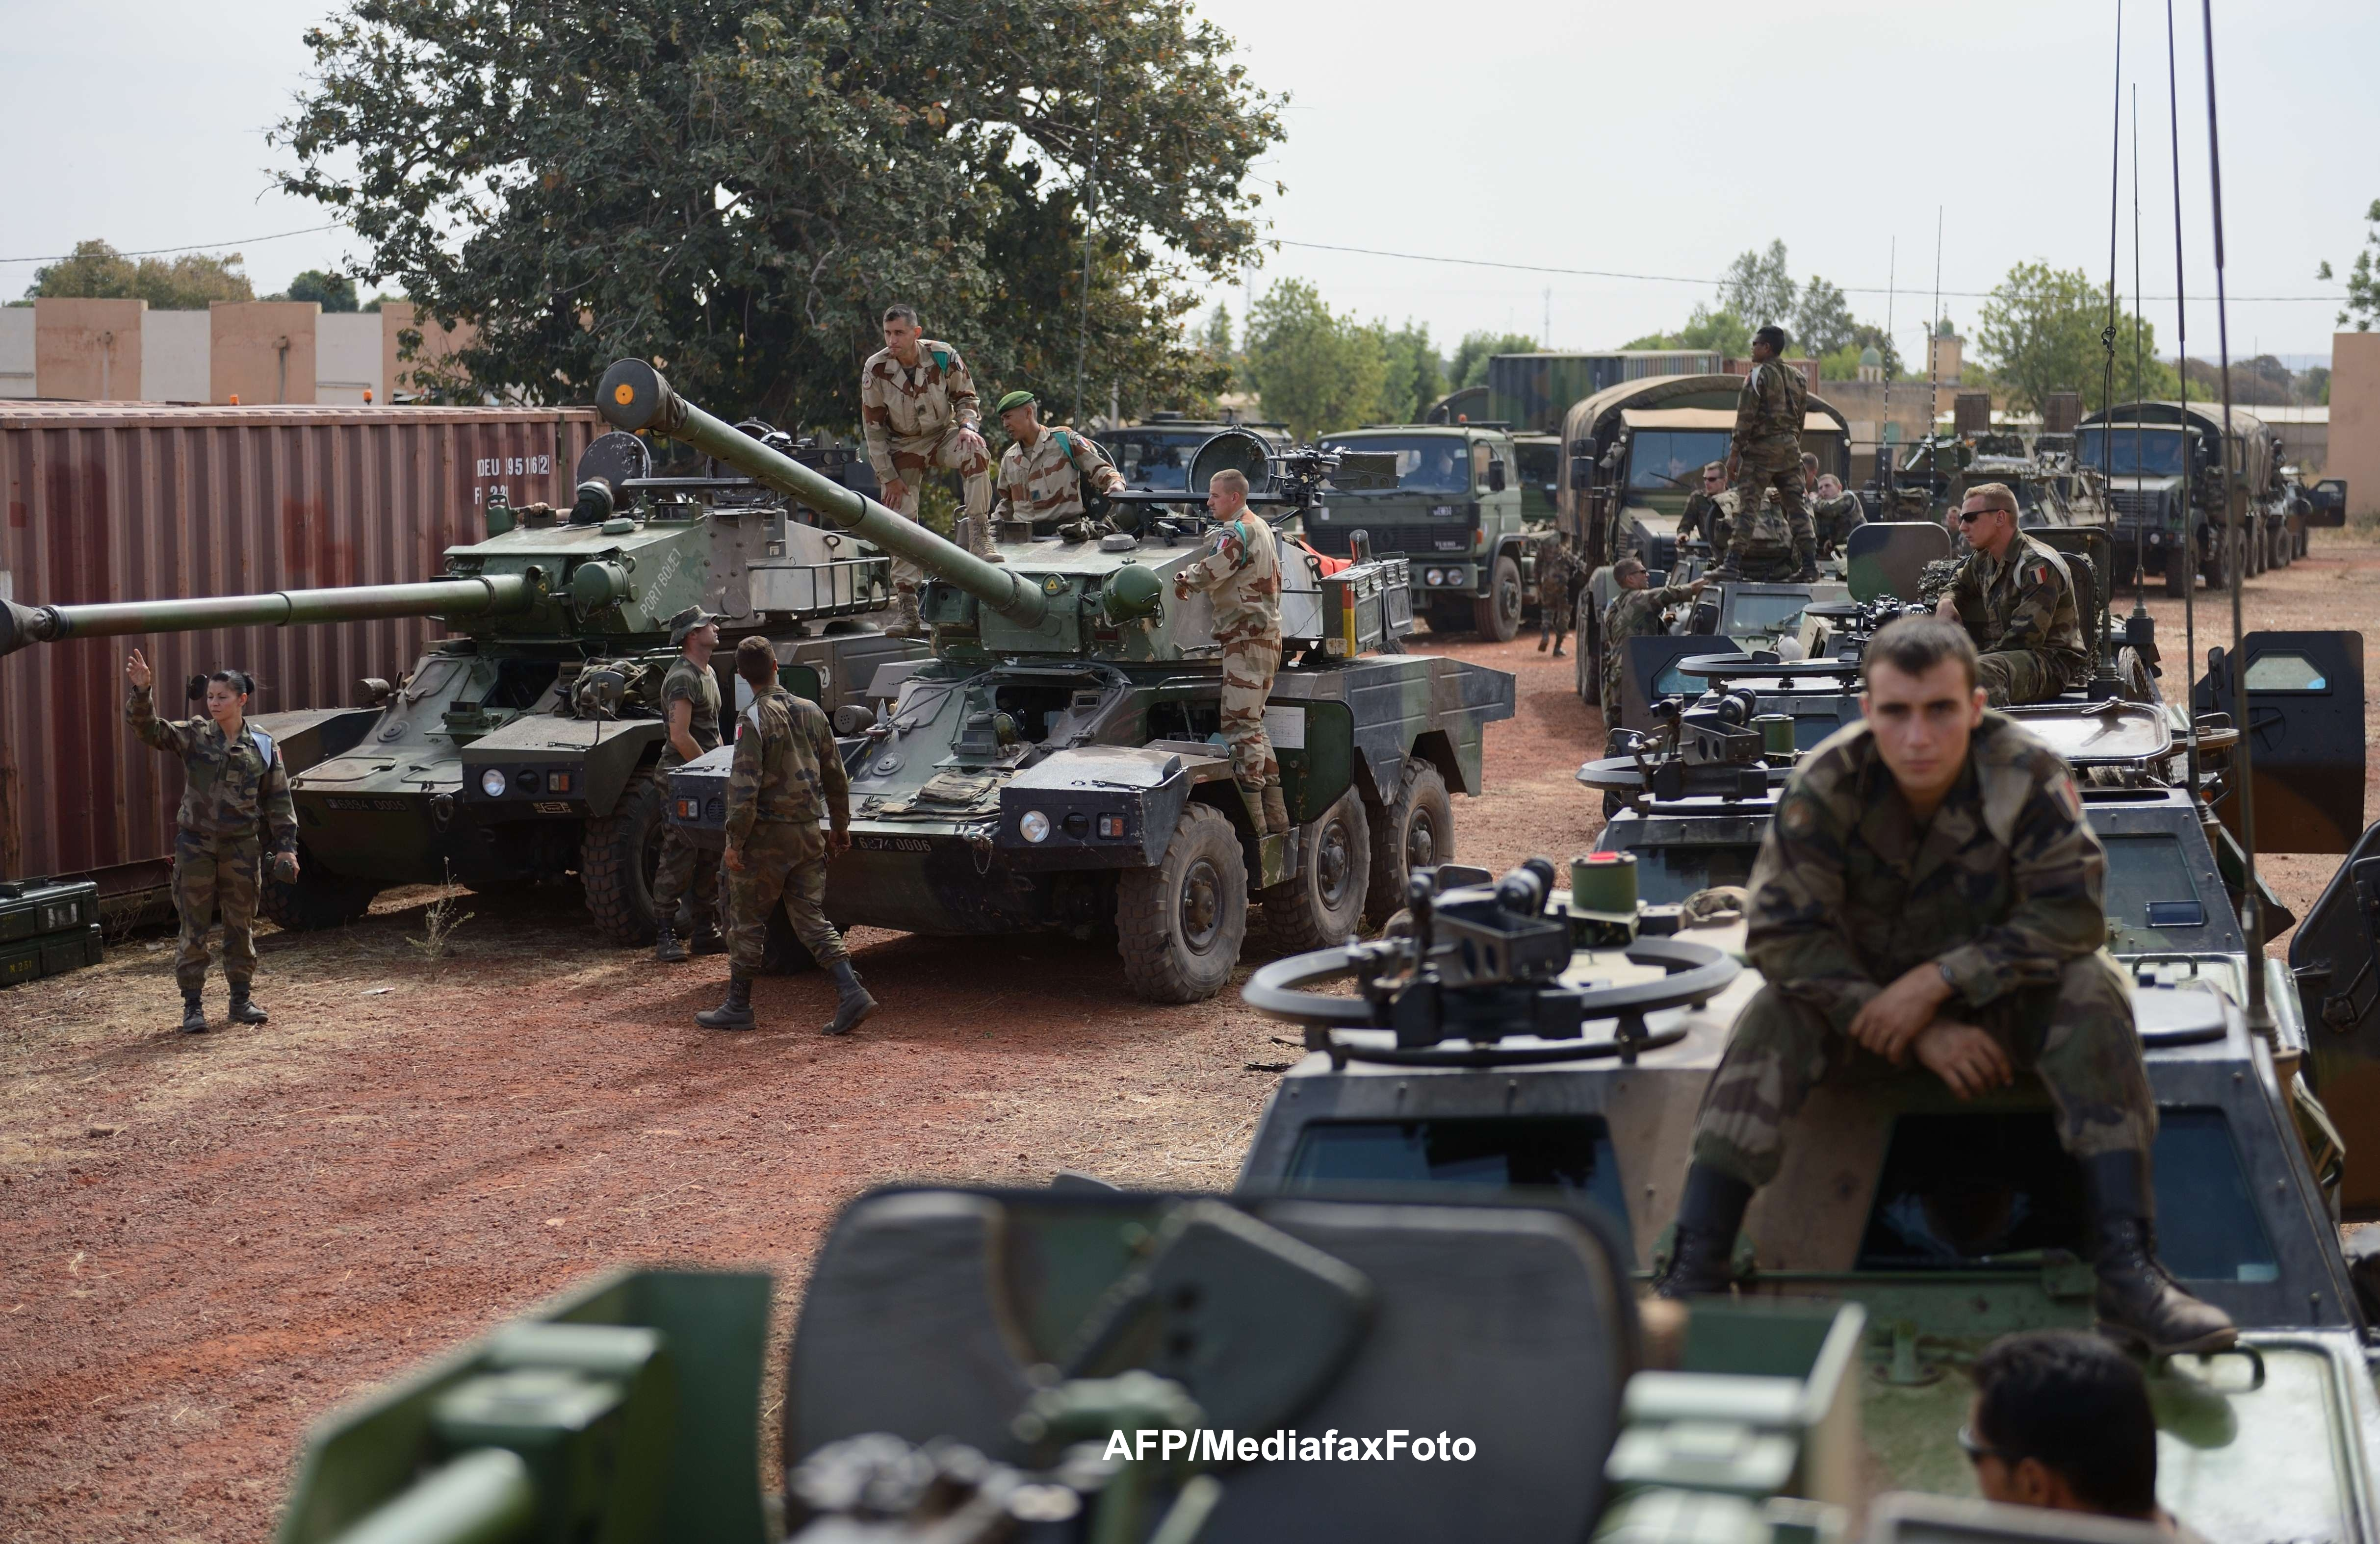 Primele imagini VIDEO din Algeria. Cum a intervenit armata ca sa-i lichideze pe islamisti